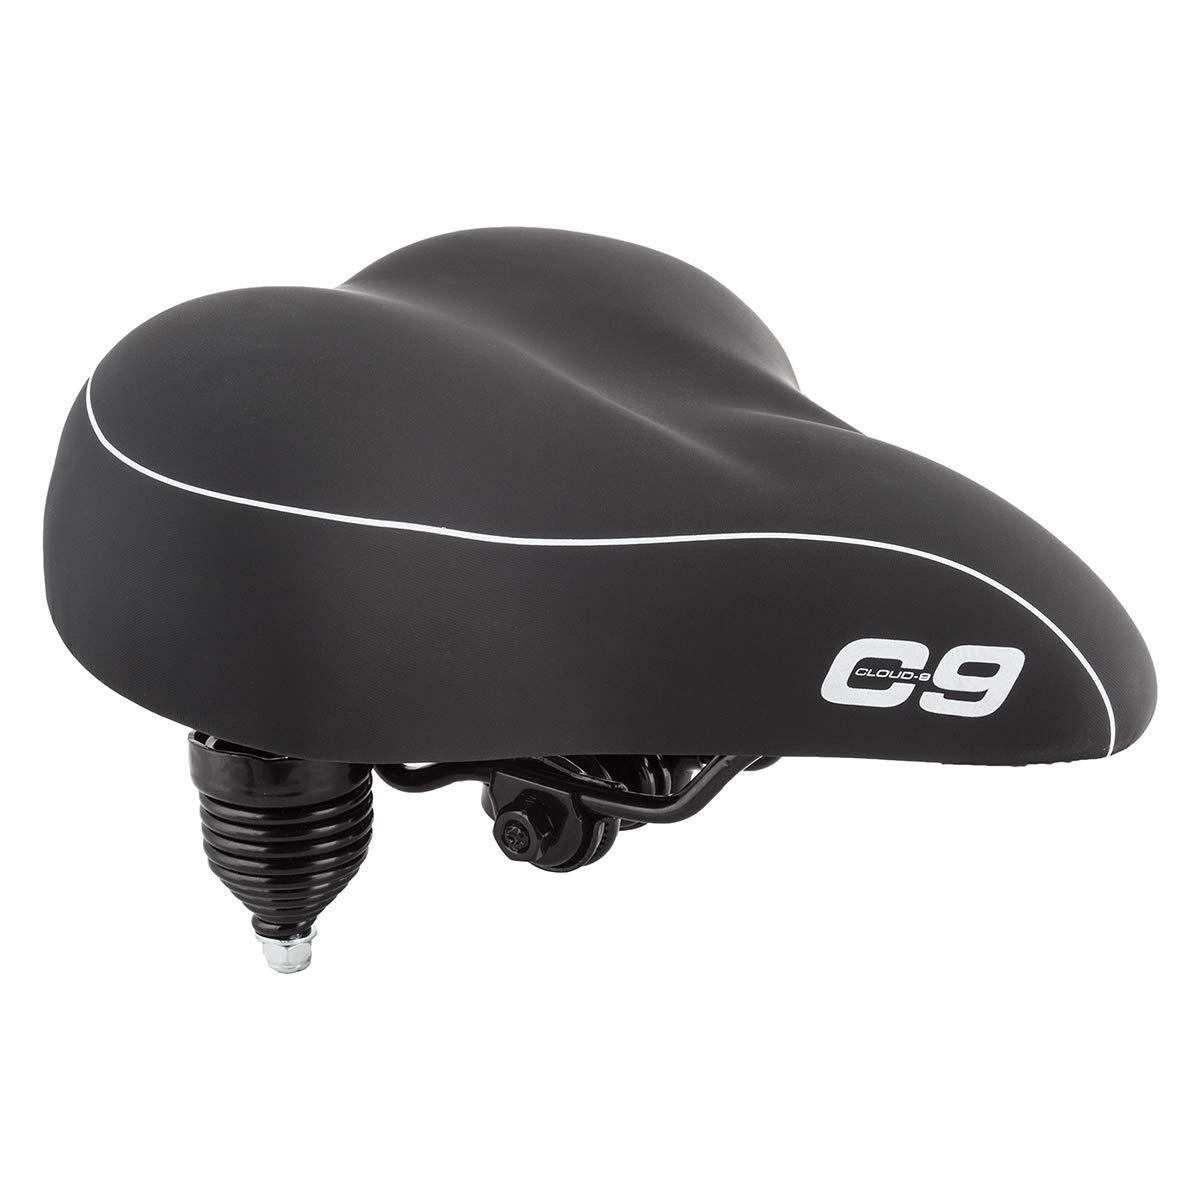 Sunlite Cloud-9 Bicycle Suspension Cruiser Saddle, Cruiser Gel, Tri-color Black by Cloud-9 (Image #1)